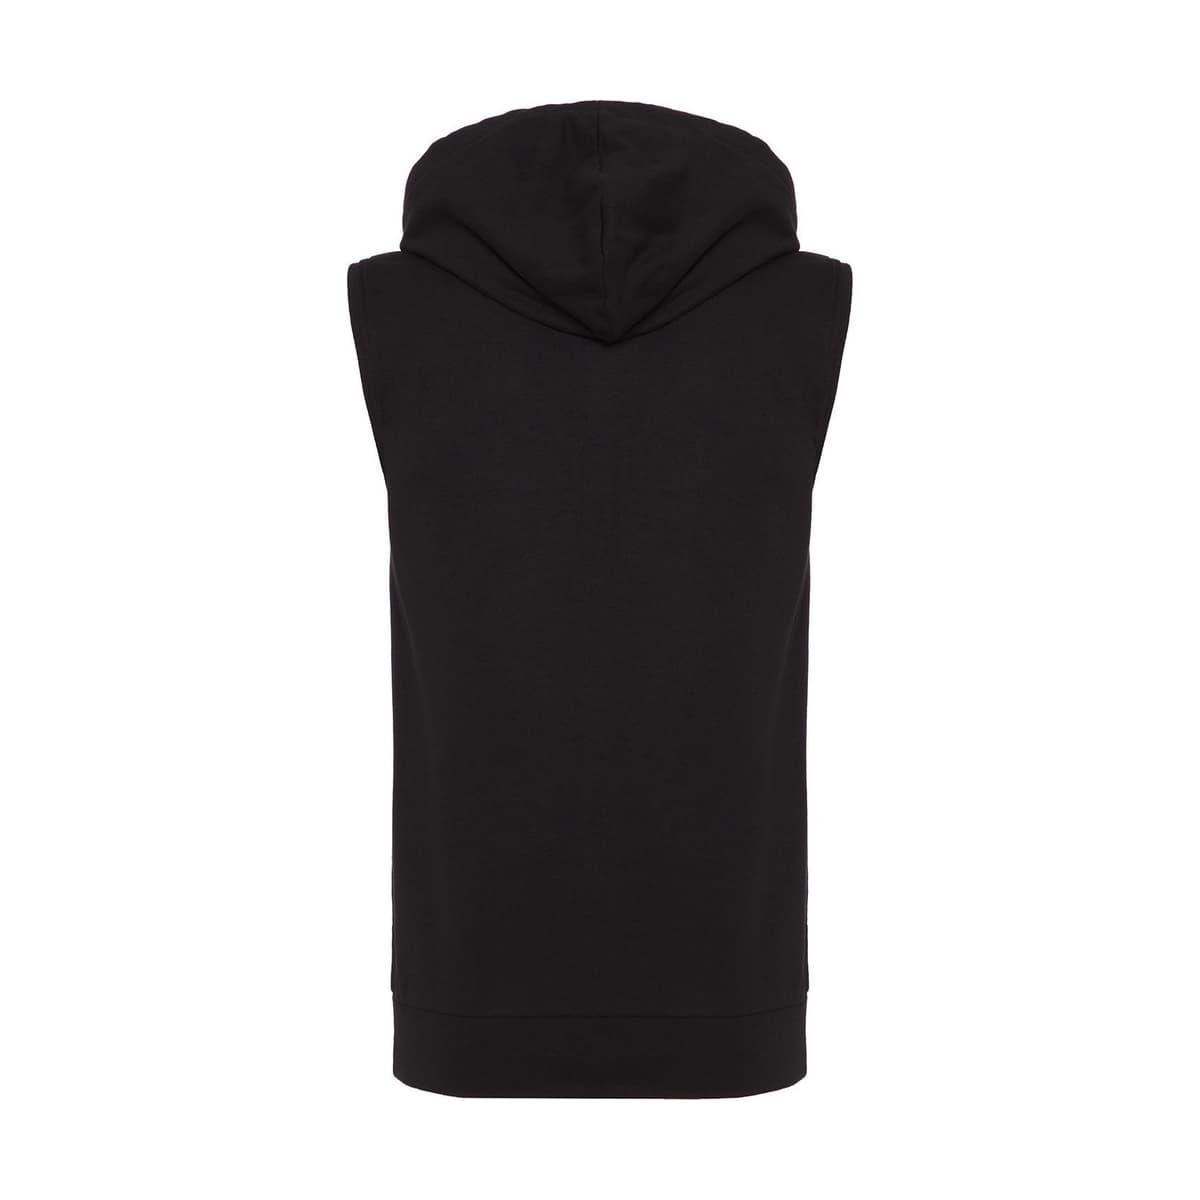 Erkek Kolsuz Kapüşonlu Siyah Sweatshirt (MPH1109-BK)